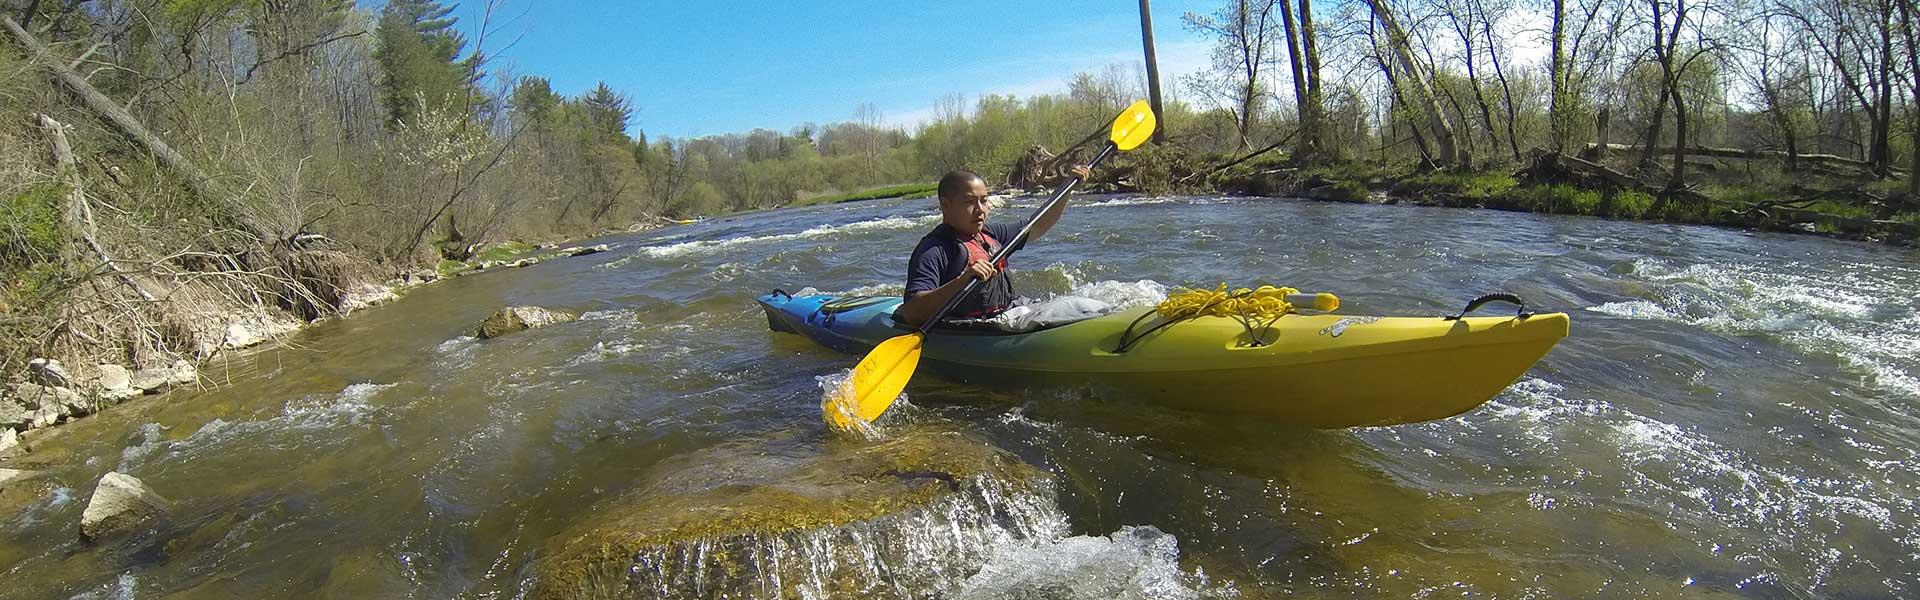 Kayak Rentals and Trips near Toronto